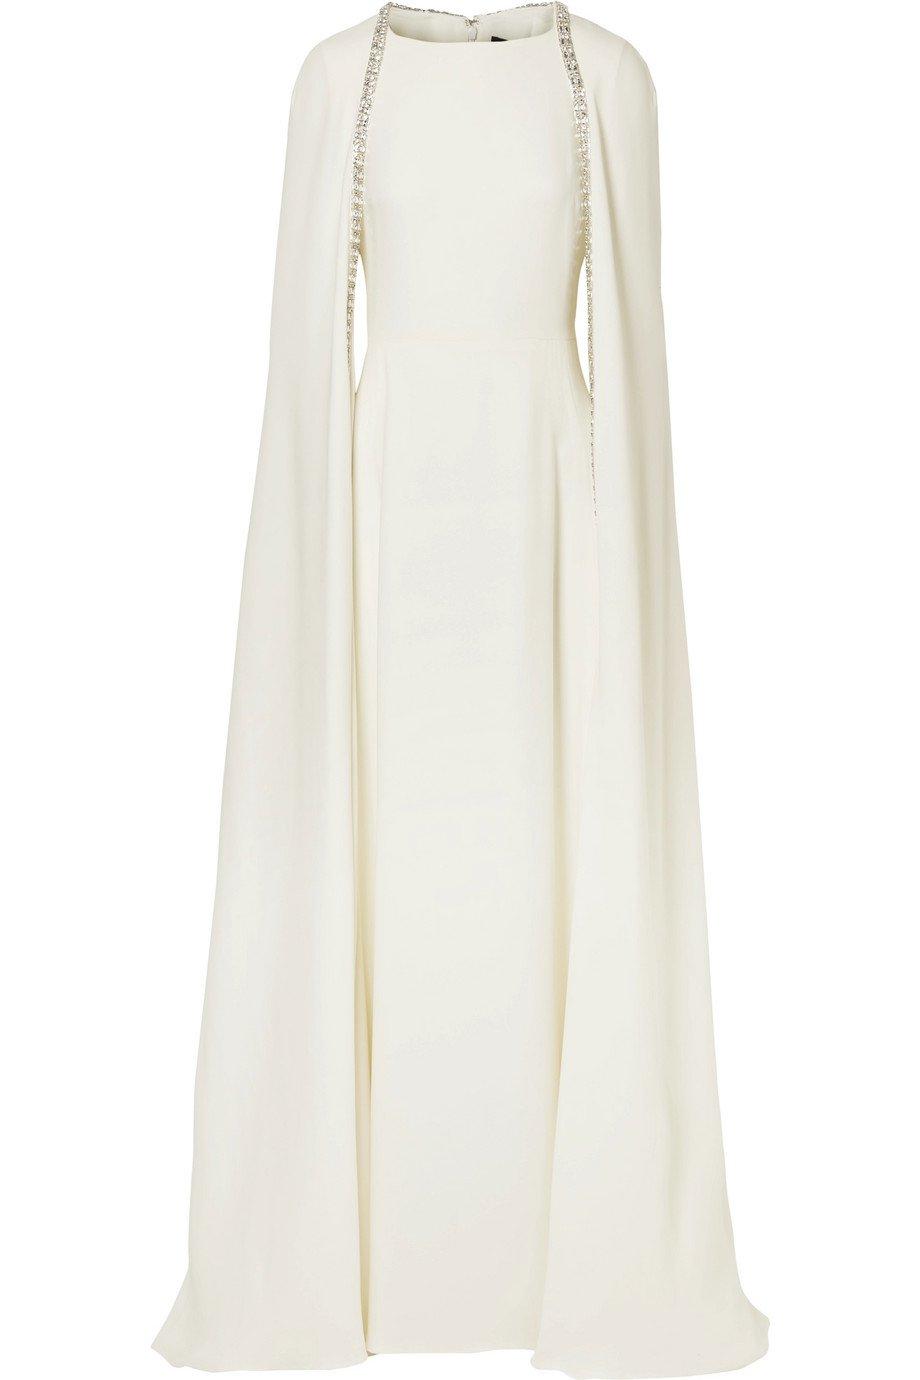 Reem Acra | Crystal-embellished cape-effect silk-crepe gown | NET-A-PORTER.COM